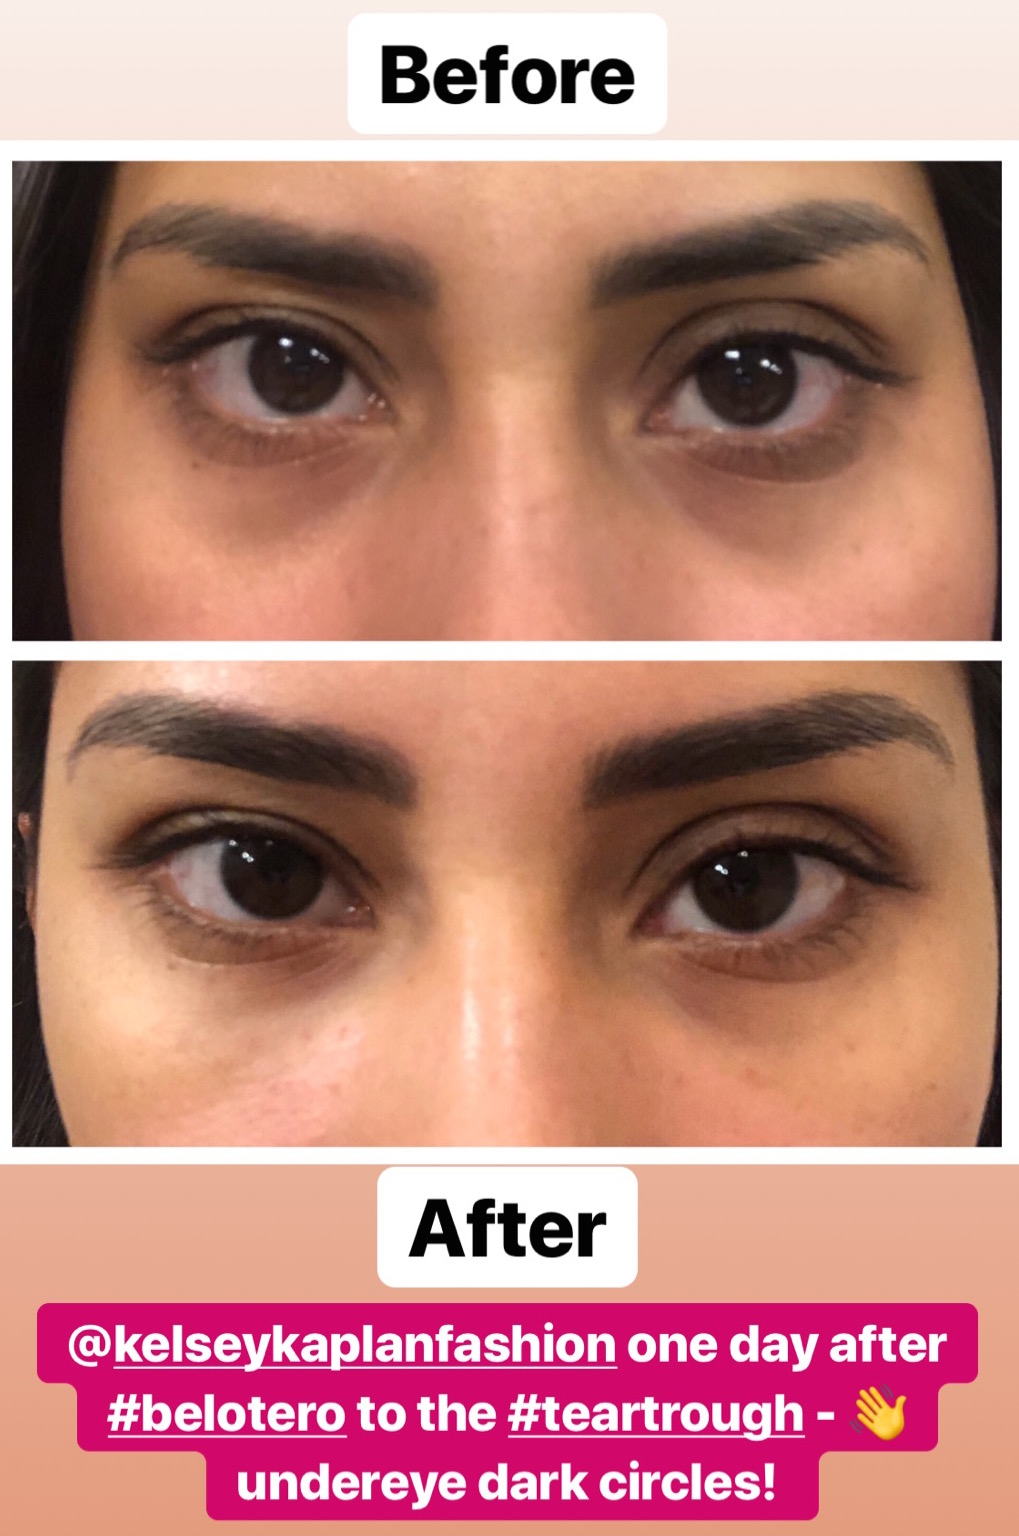 Treatment For Undereye Dark Circles [video]